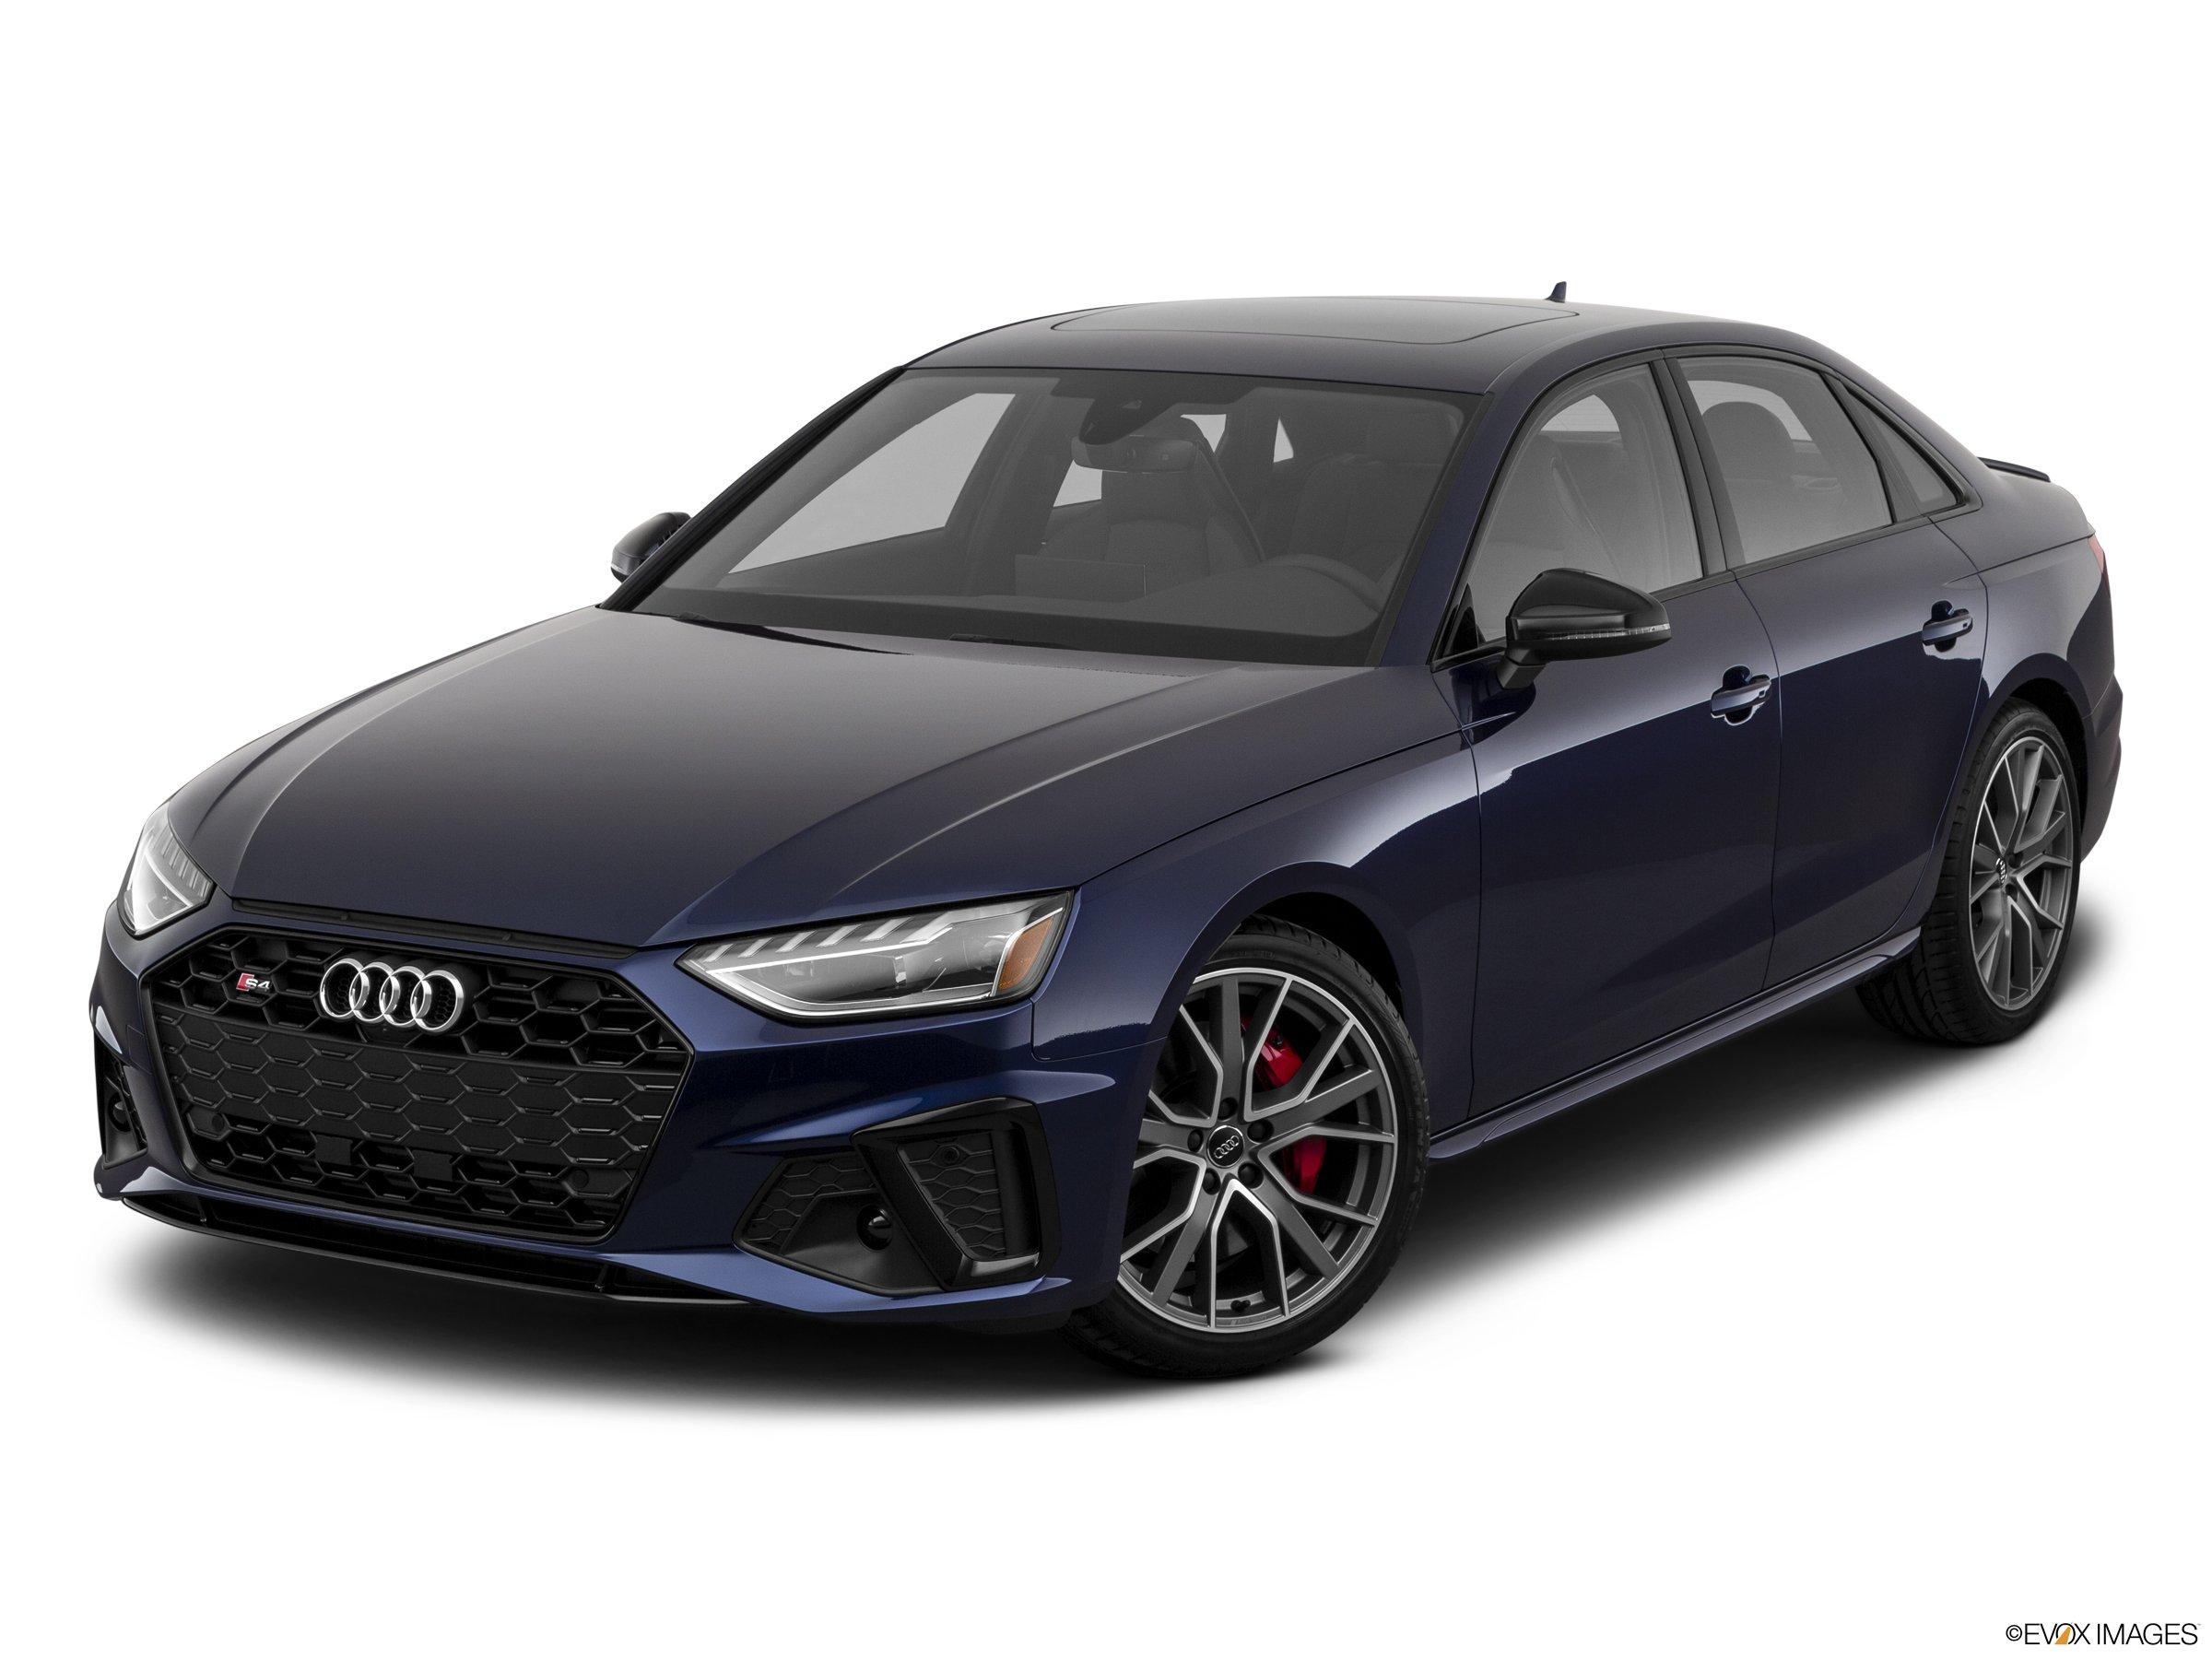 2020 Audi S4 3.0 TFSI Premium Plus AWD sedan